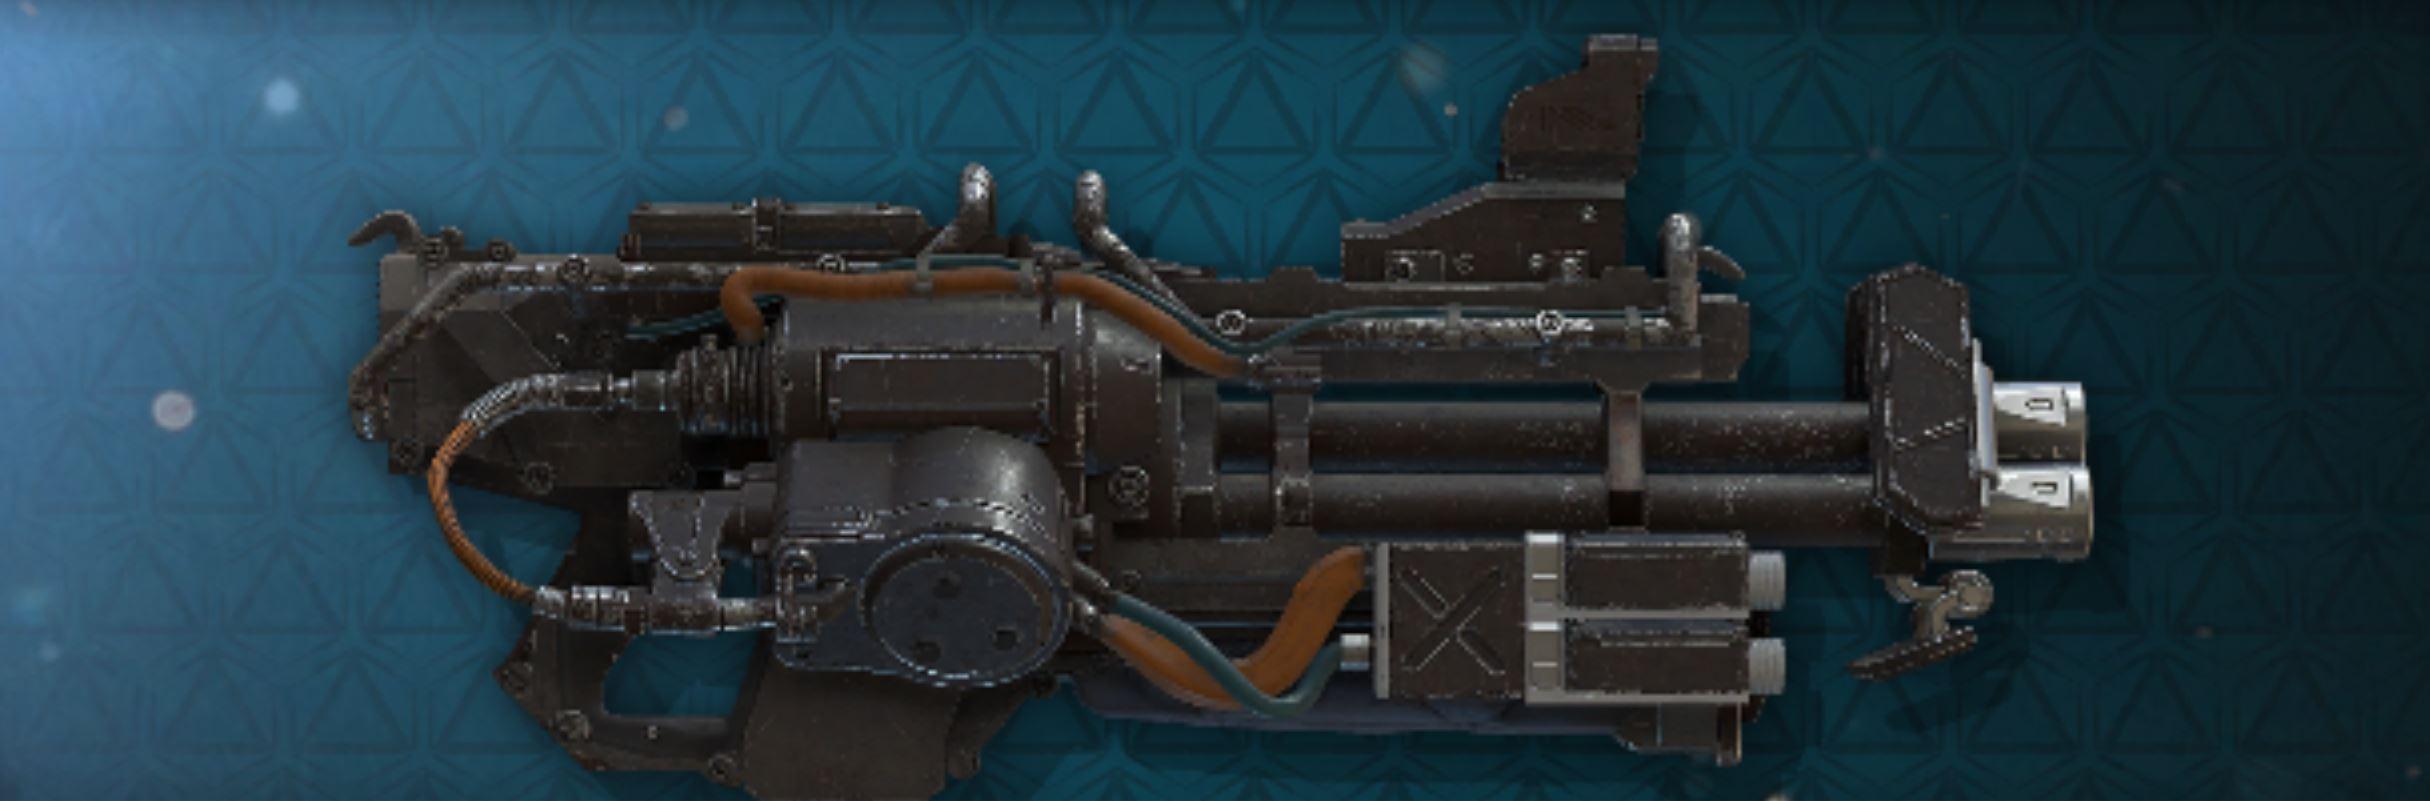 Autocannon - Cloudburst.JPG